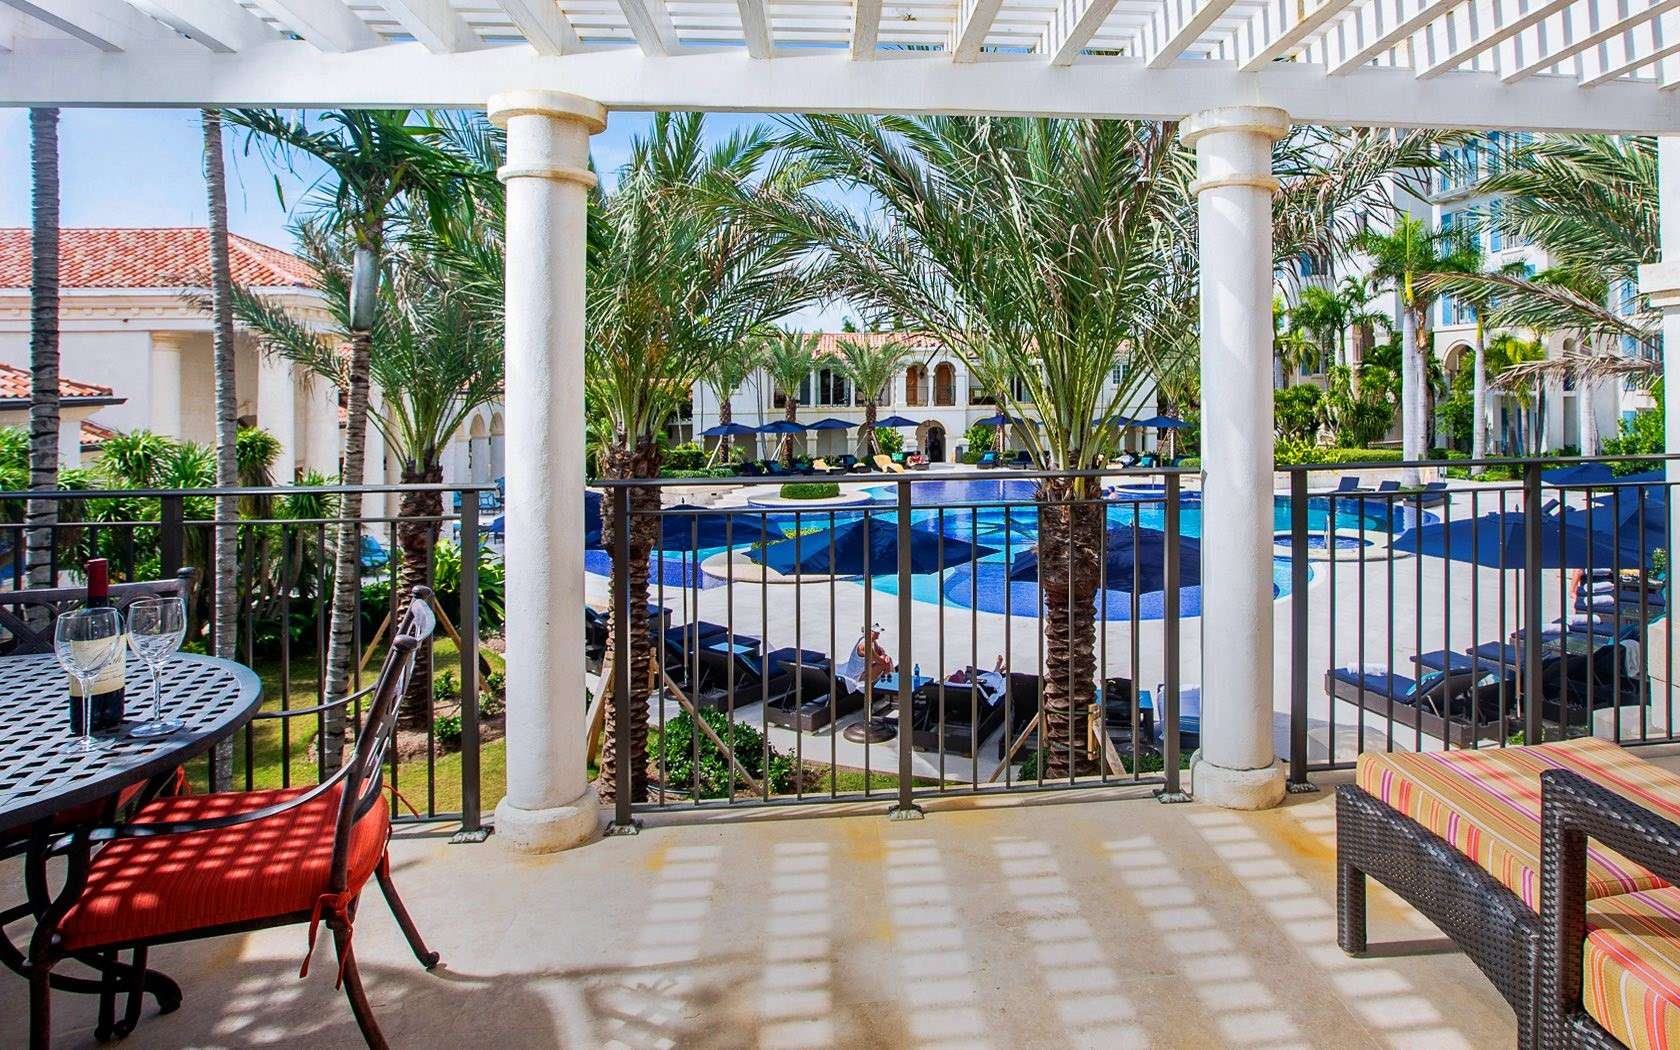 Luxury villa rentals caribbean - Turks and caicos - Providenciales - Grace bay - 2 Bedroom Pool View Suite | Bianca Sands - Image 1/7